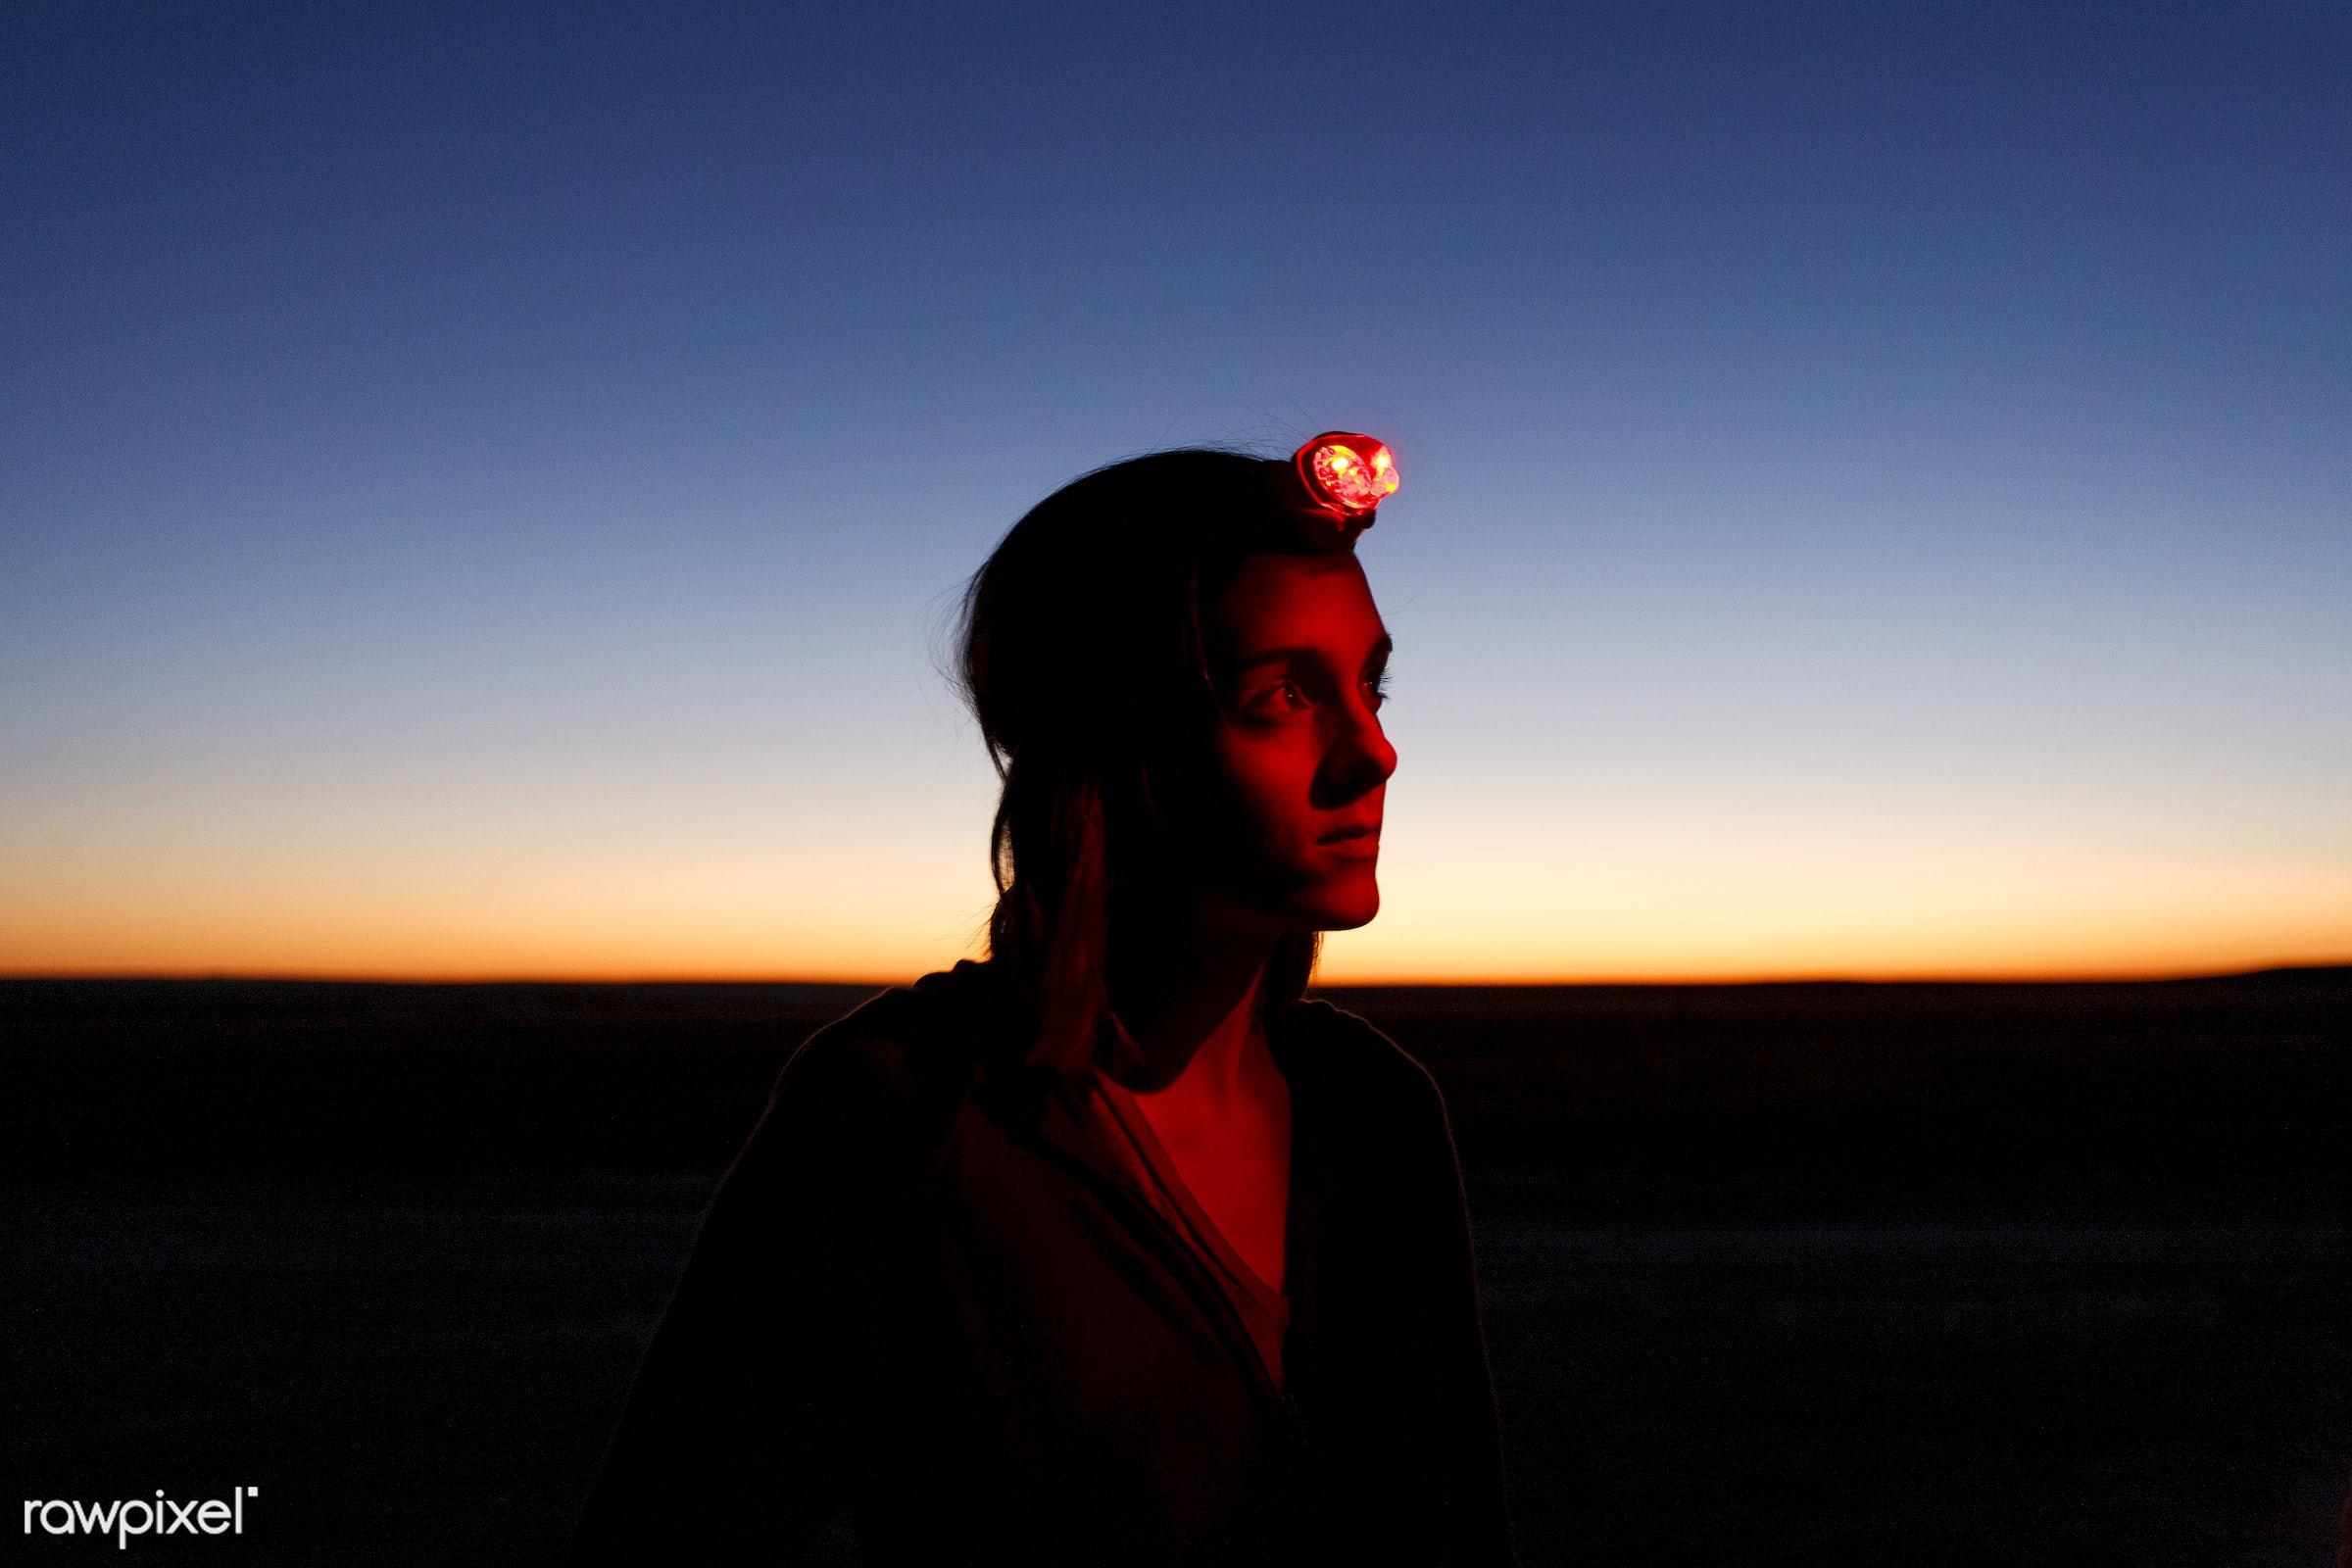 Traveler wearing headlamp - activity, adventure, alone, america, american, animal, attraction, backlit, backpacker,...